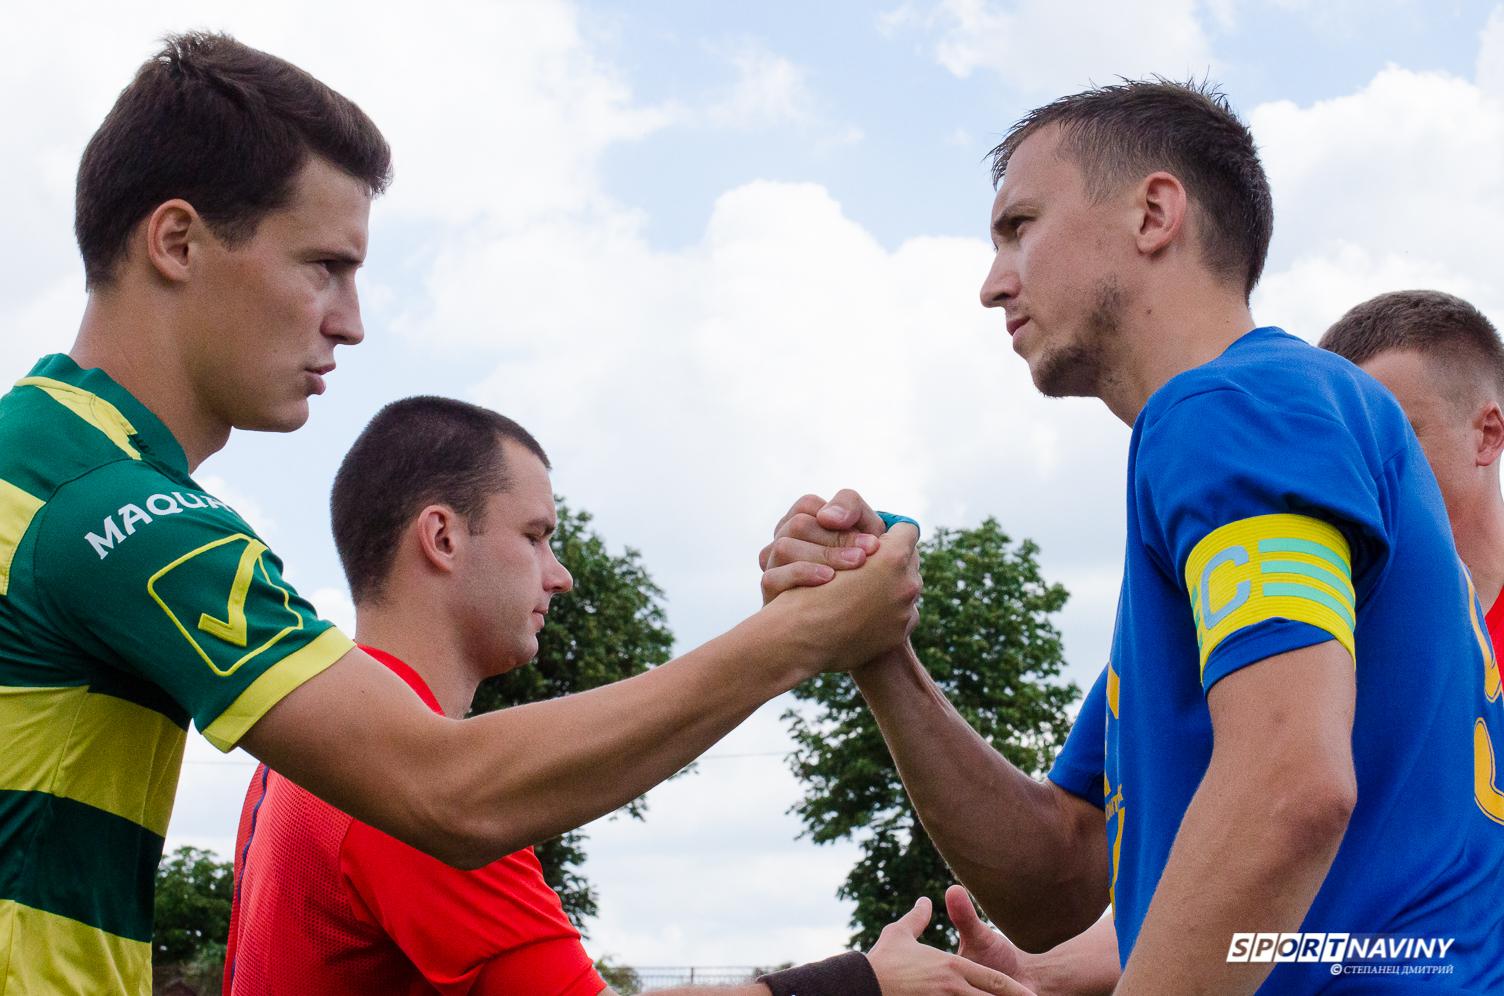 FC Kletsk 1:5 SC Sputnik. 05/08/2017